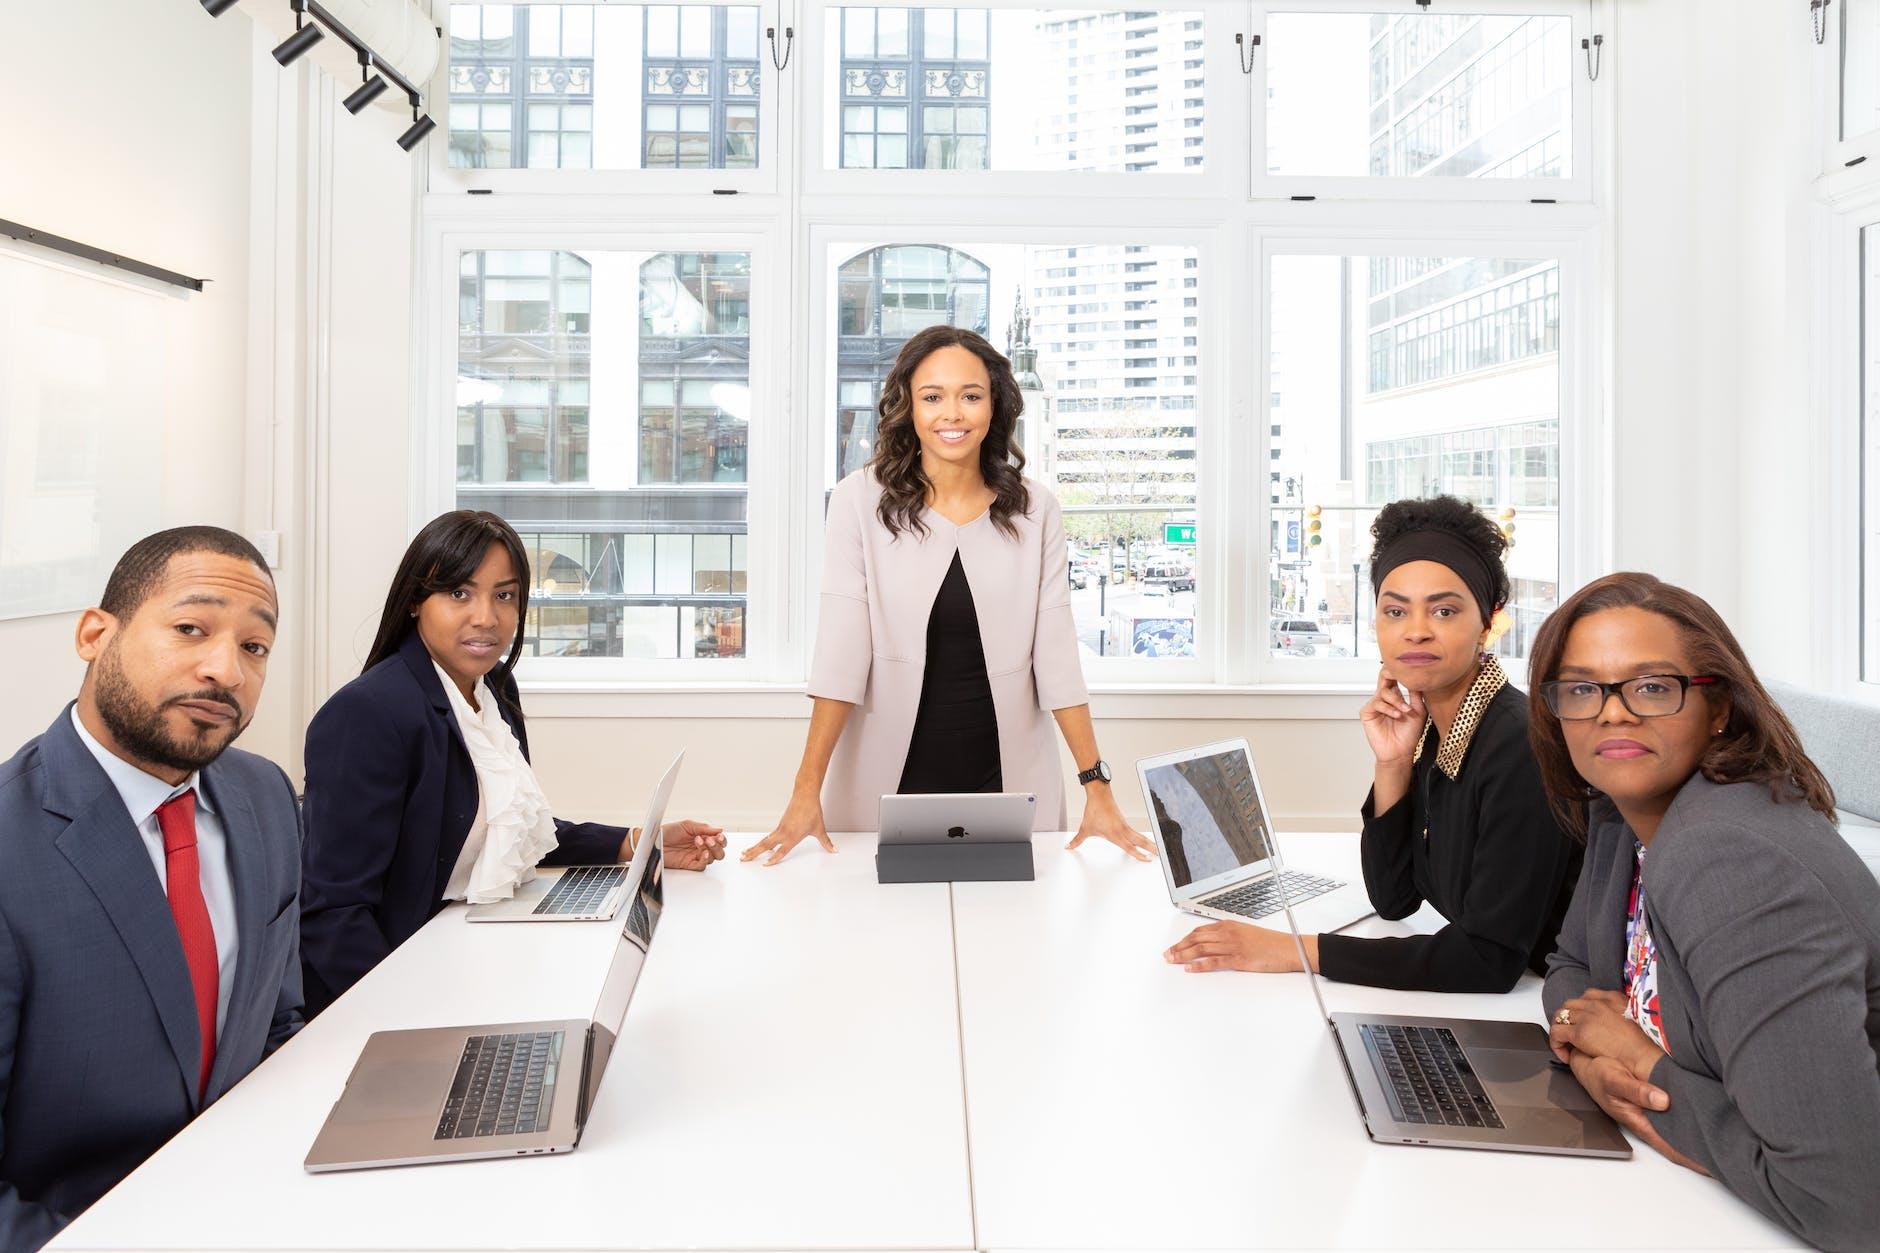 Finance Jobs: Career Options For Graduates & Newbies